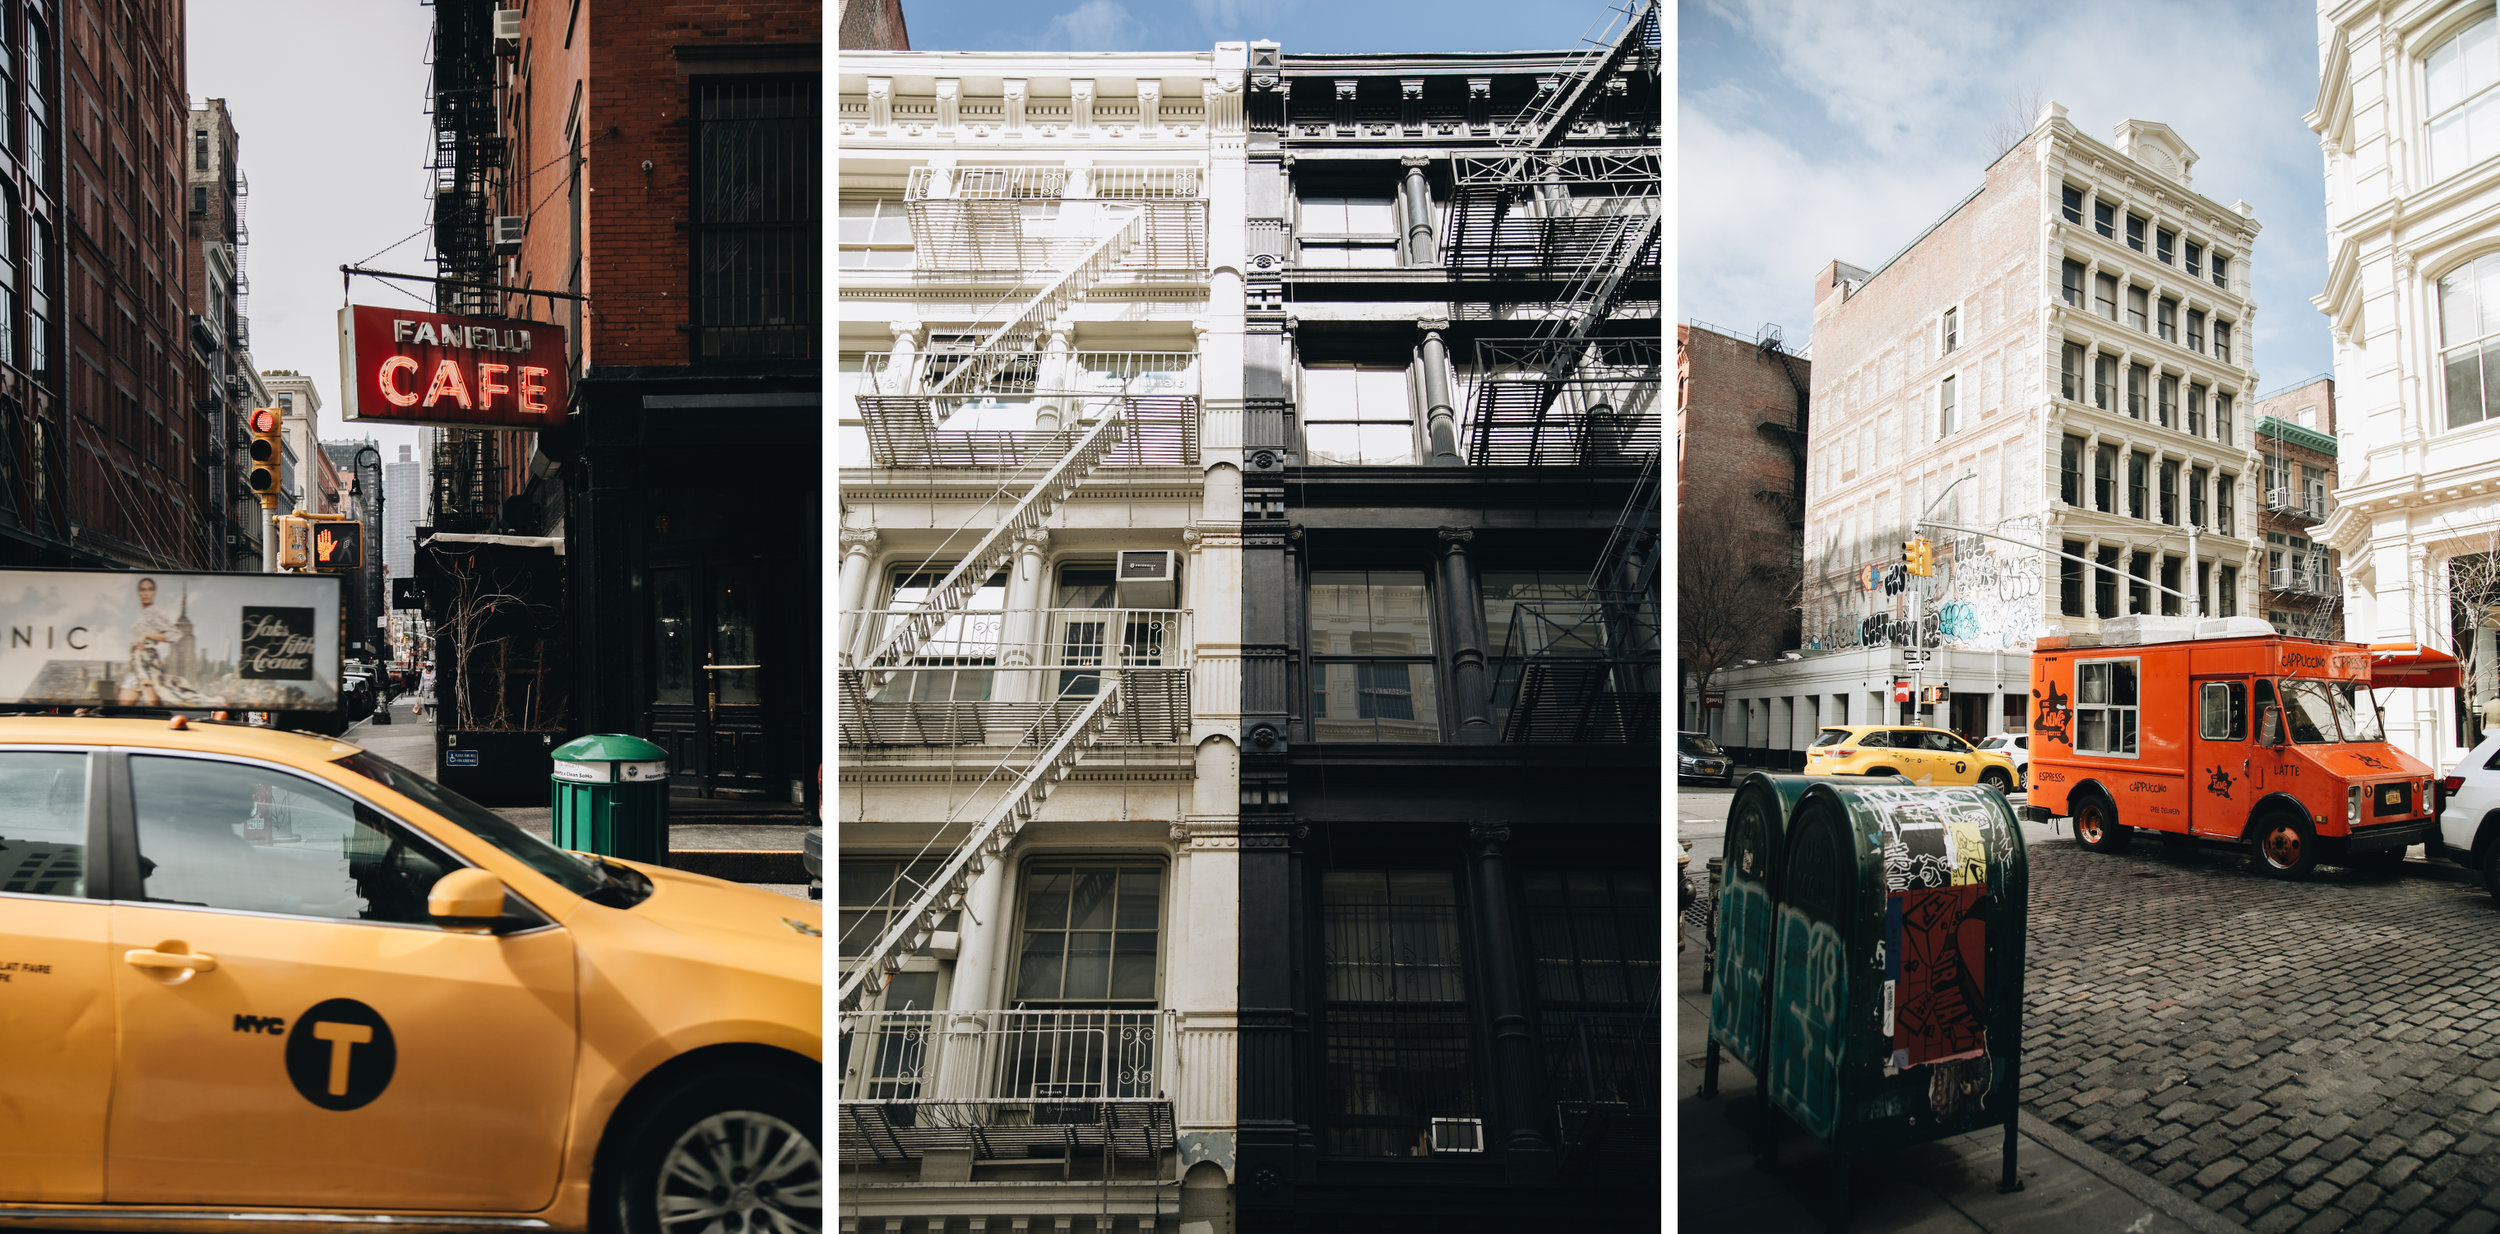 SoHo-voyage-à-new-york-onmyway-blog.jpg